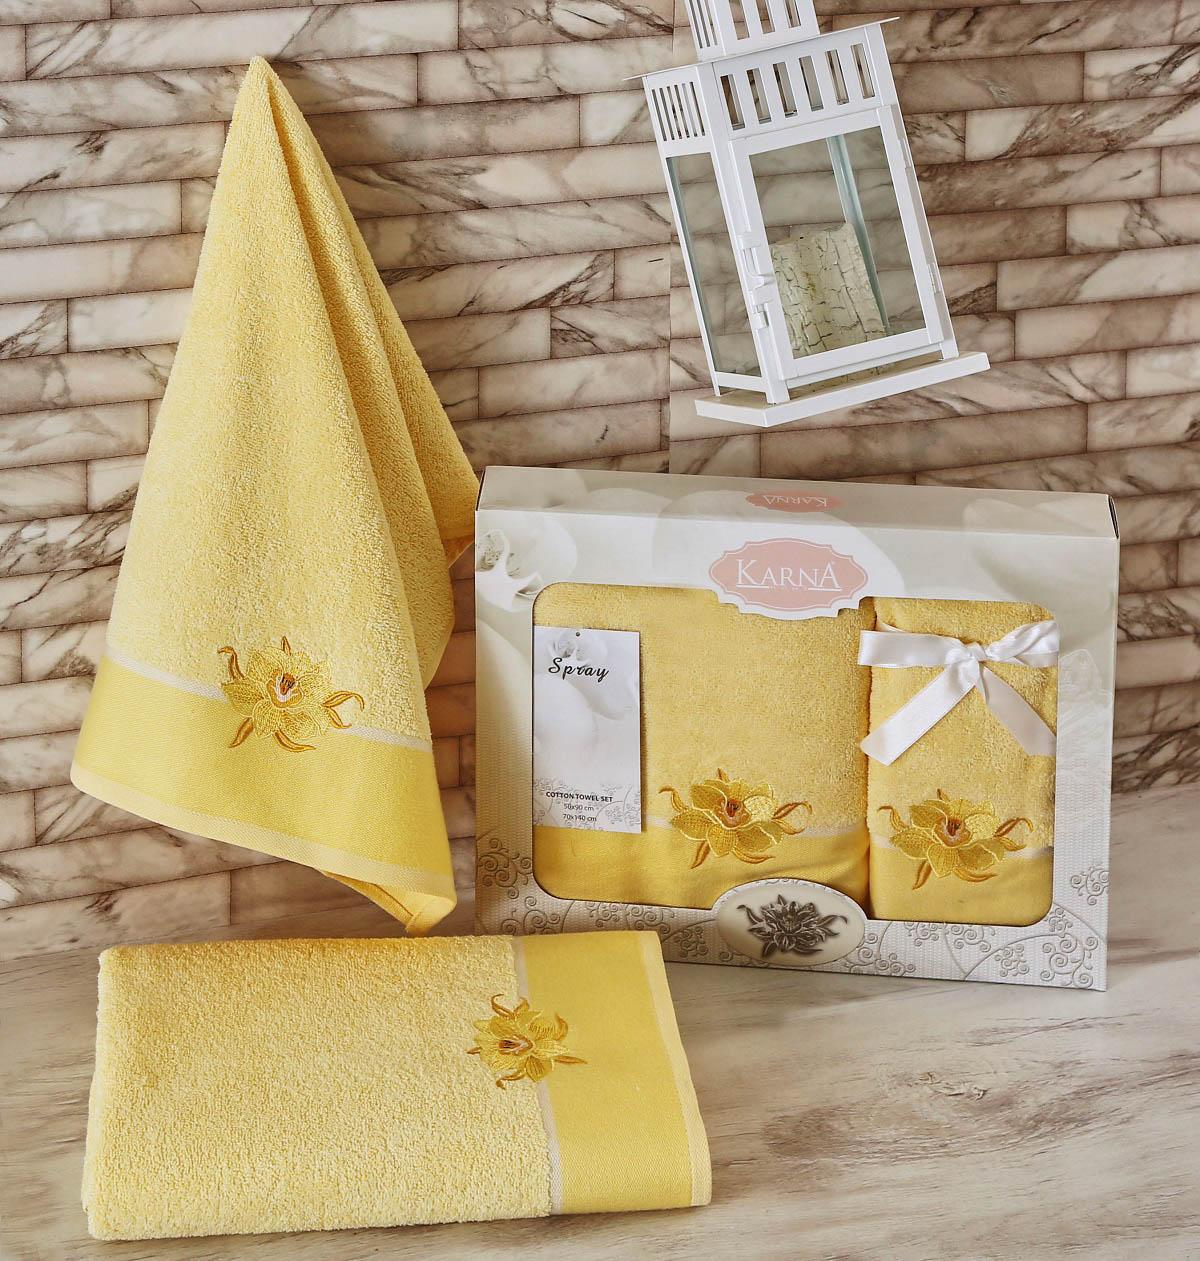 Полотенца Karna Полотенце Spray Цвет: Светло-Желтый (Набор) полотенце karna цвет желтый